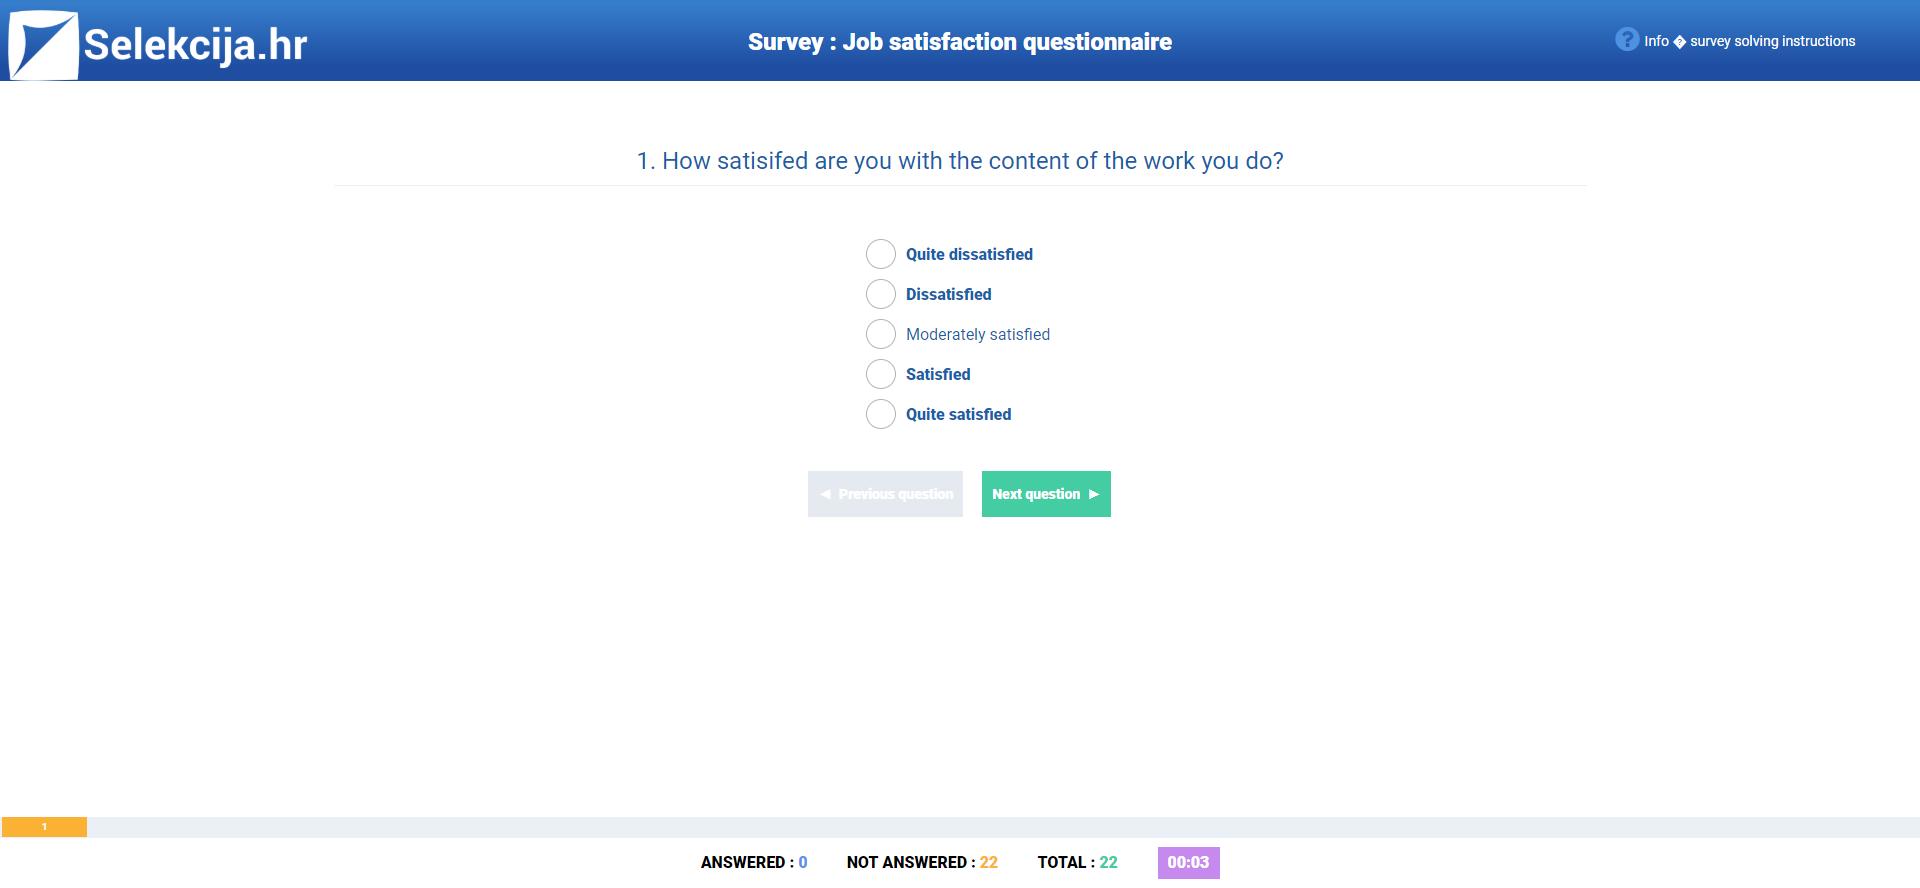 screencapture-online-selekcija-hr-assessment-edit-test-online-start-2019-04-30-11_46_27